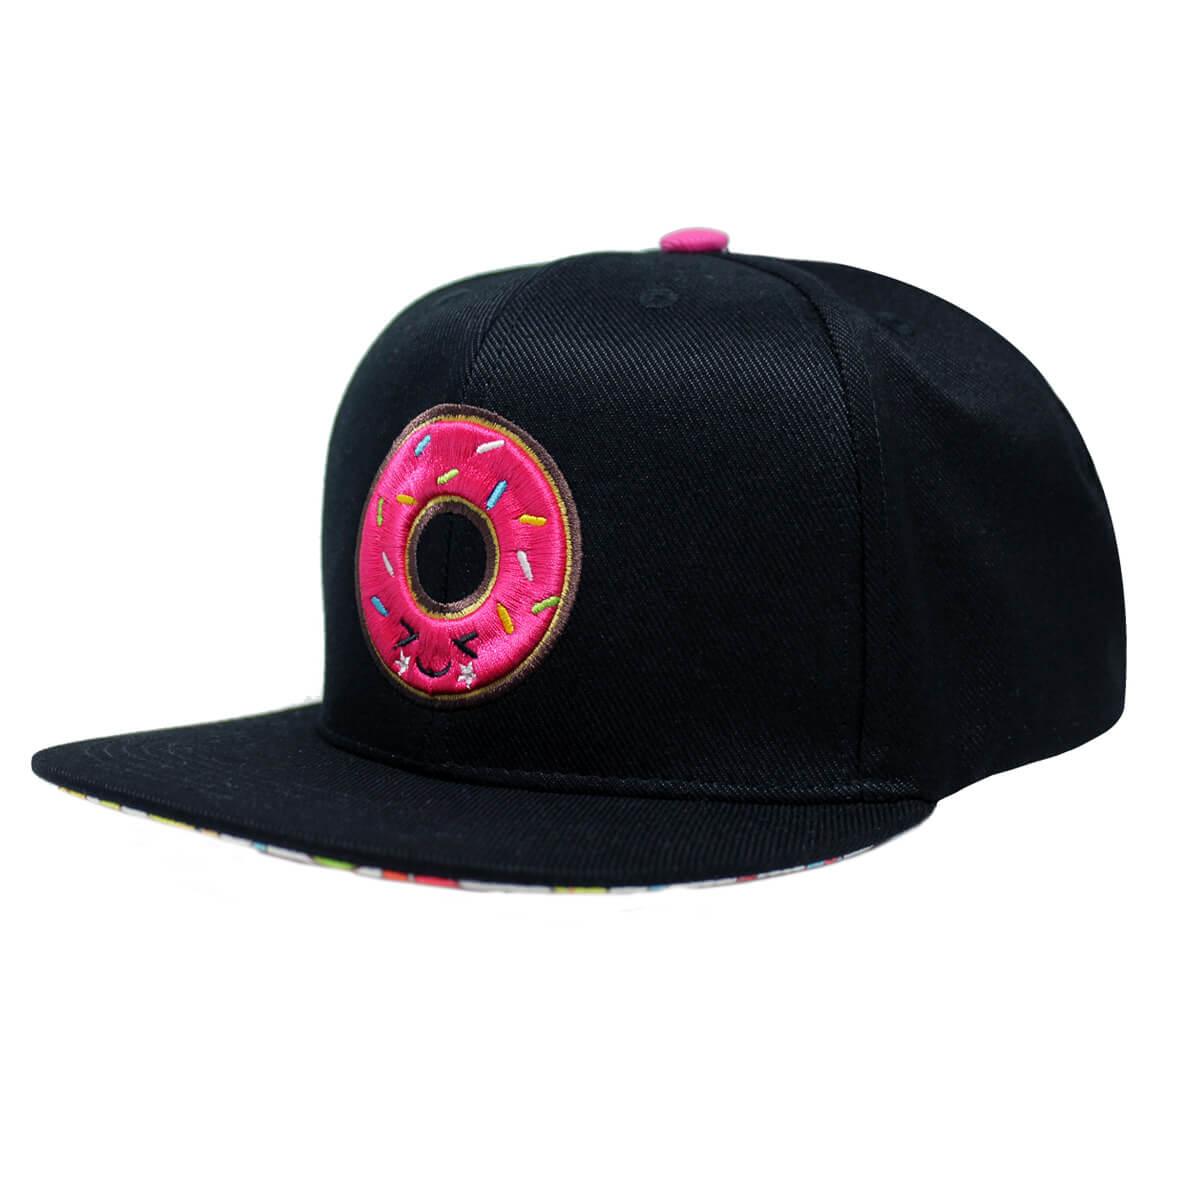 Boné Aba Reta Snapback Hoshwear Donut